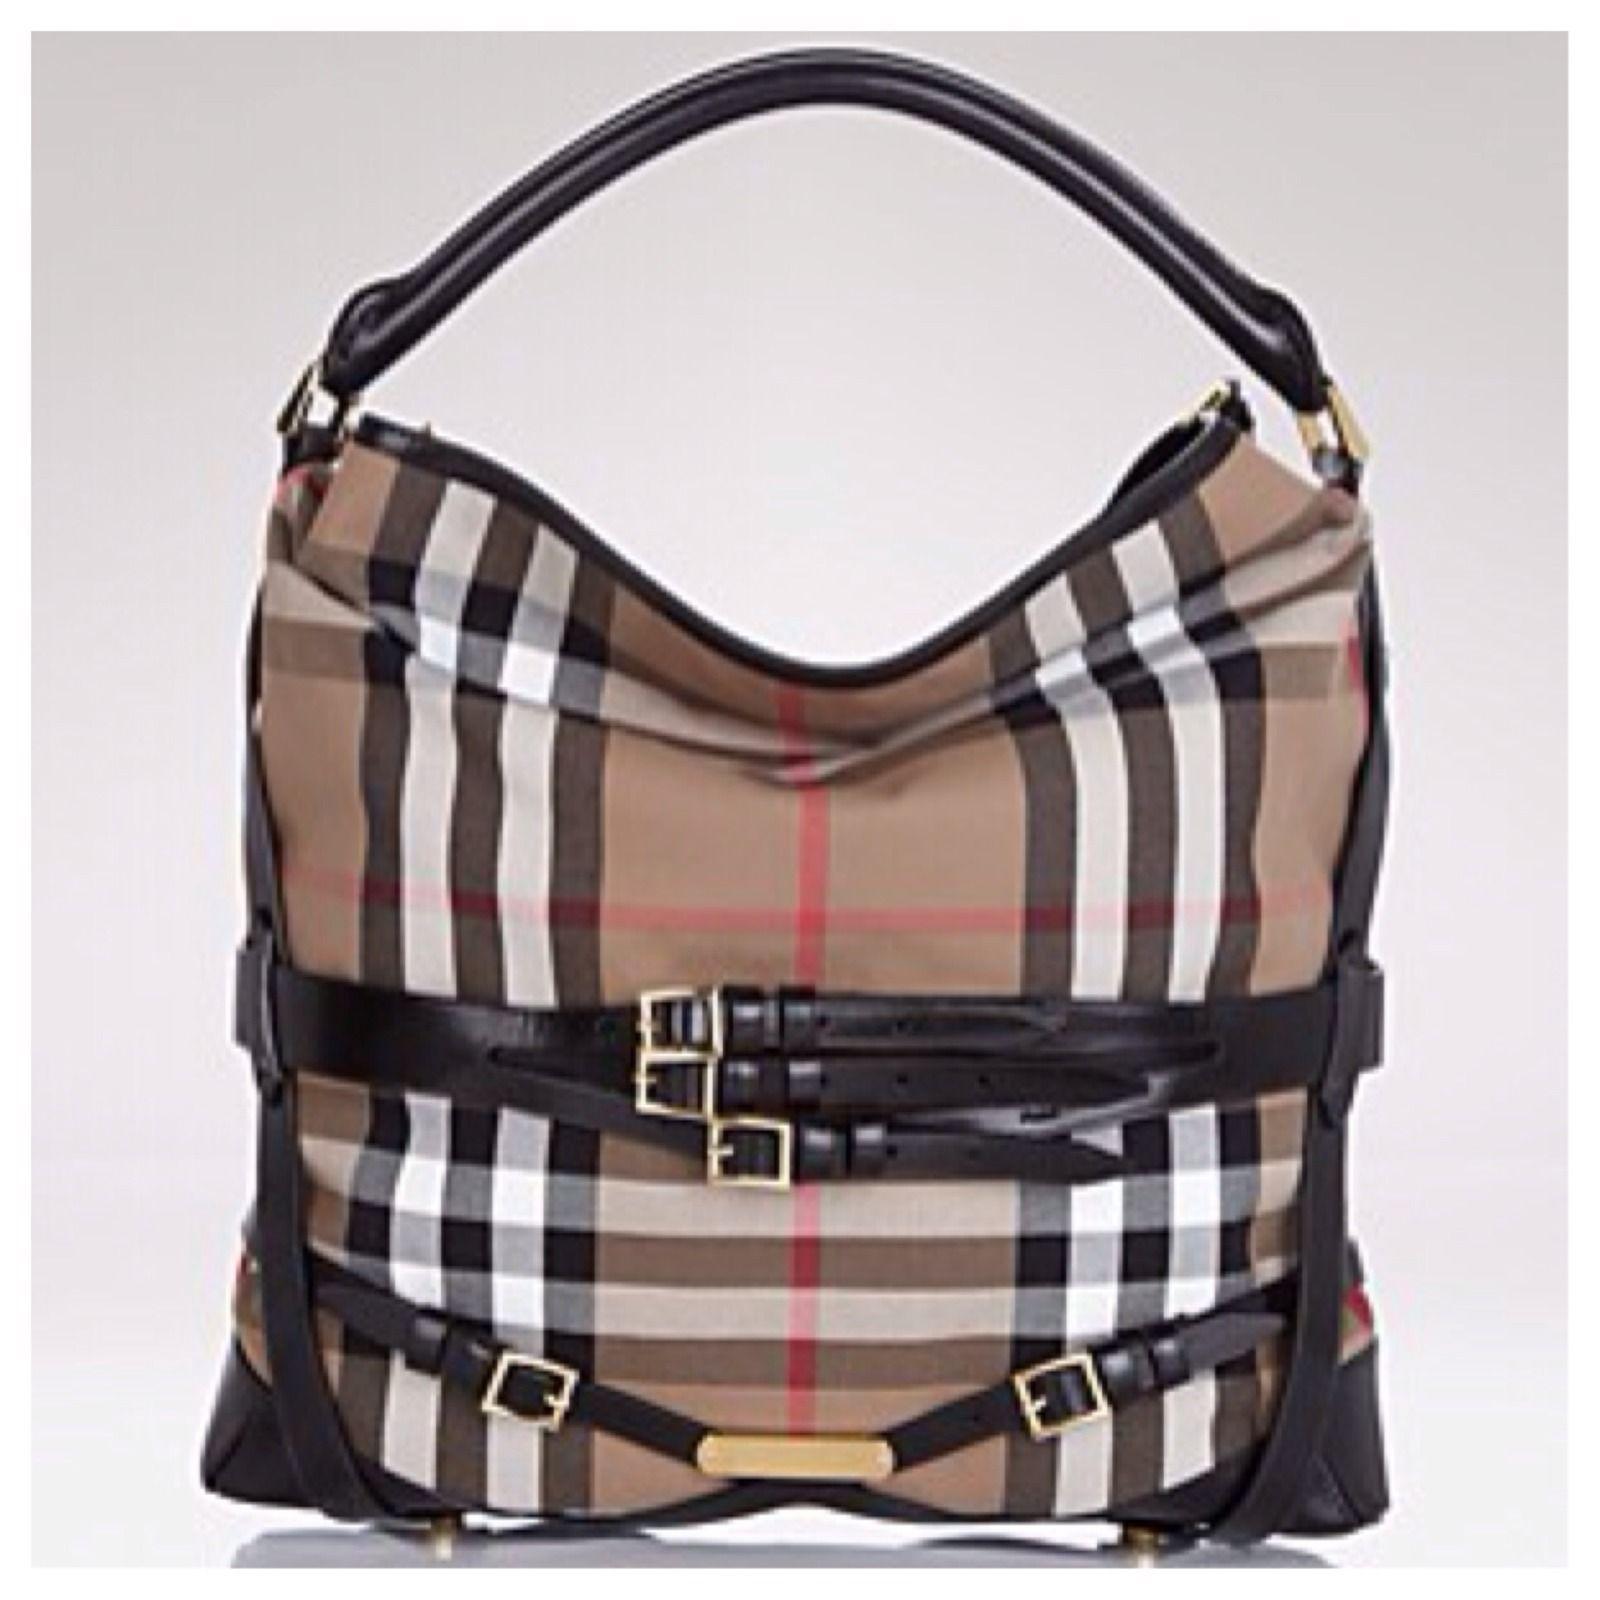 3cedfda46b50 Auth Burberry Bridle House Check Medium Gosford Hobo Bag Black ...